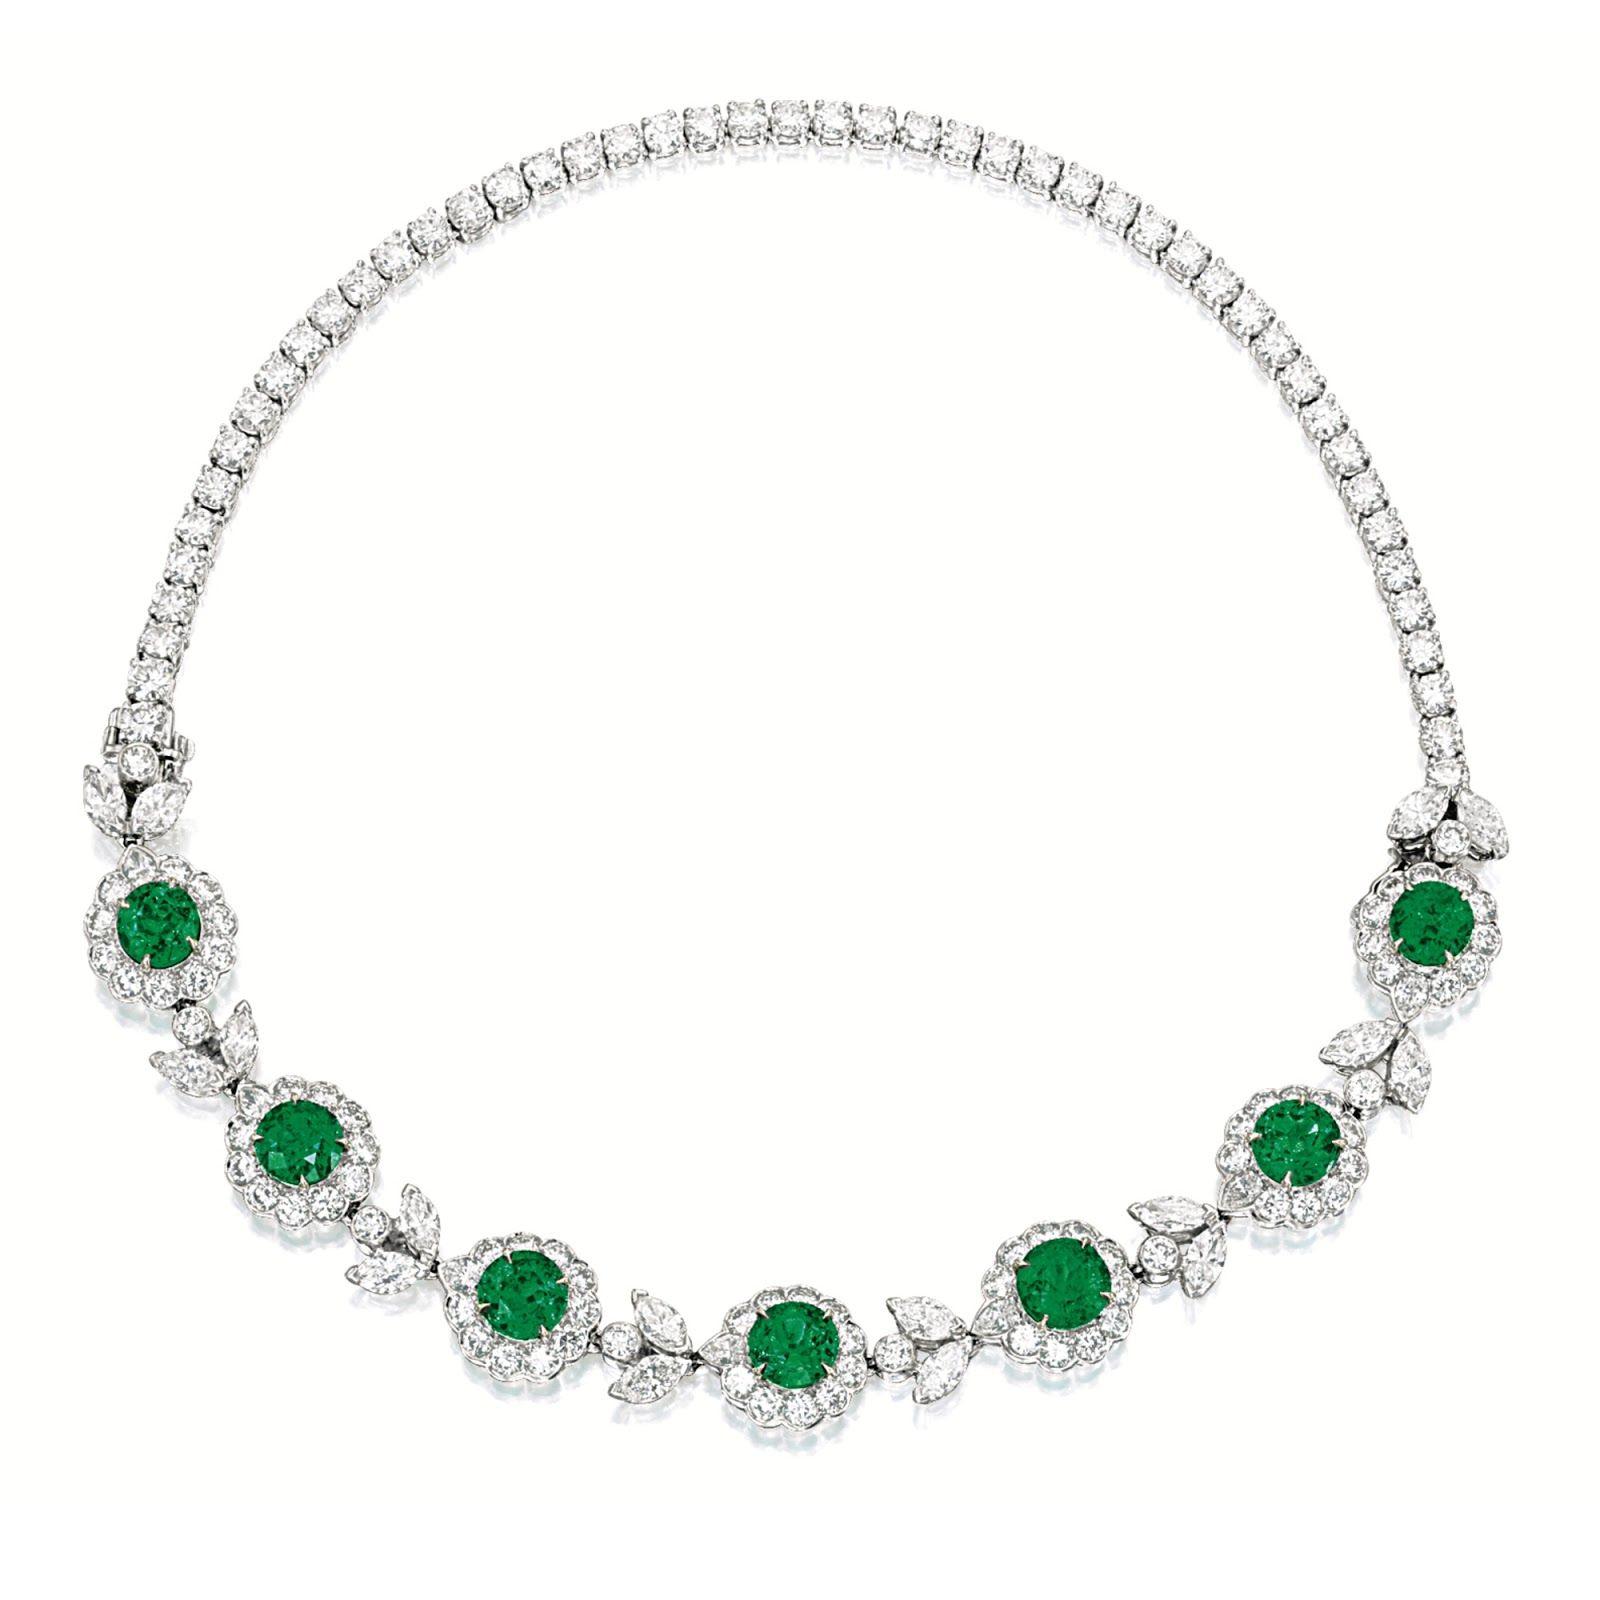 Marie poutineus jewels u royals elegant green necklaces iii